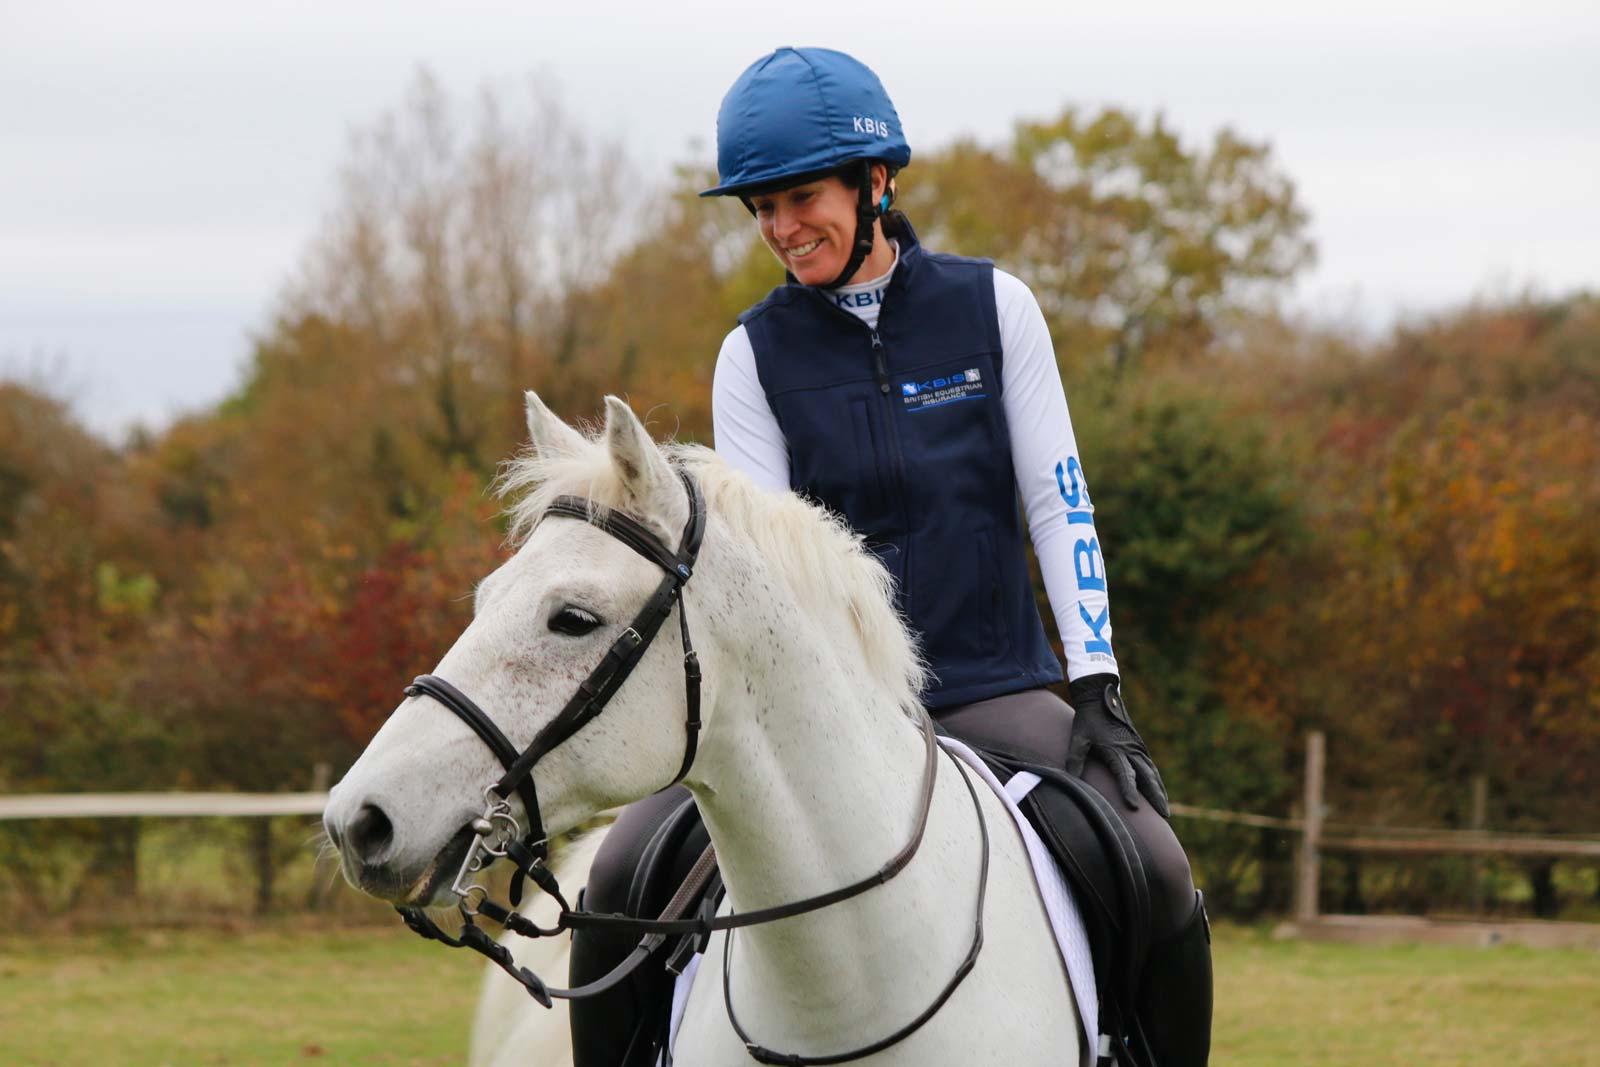 kbis horse insurance